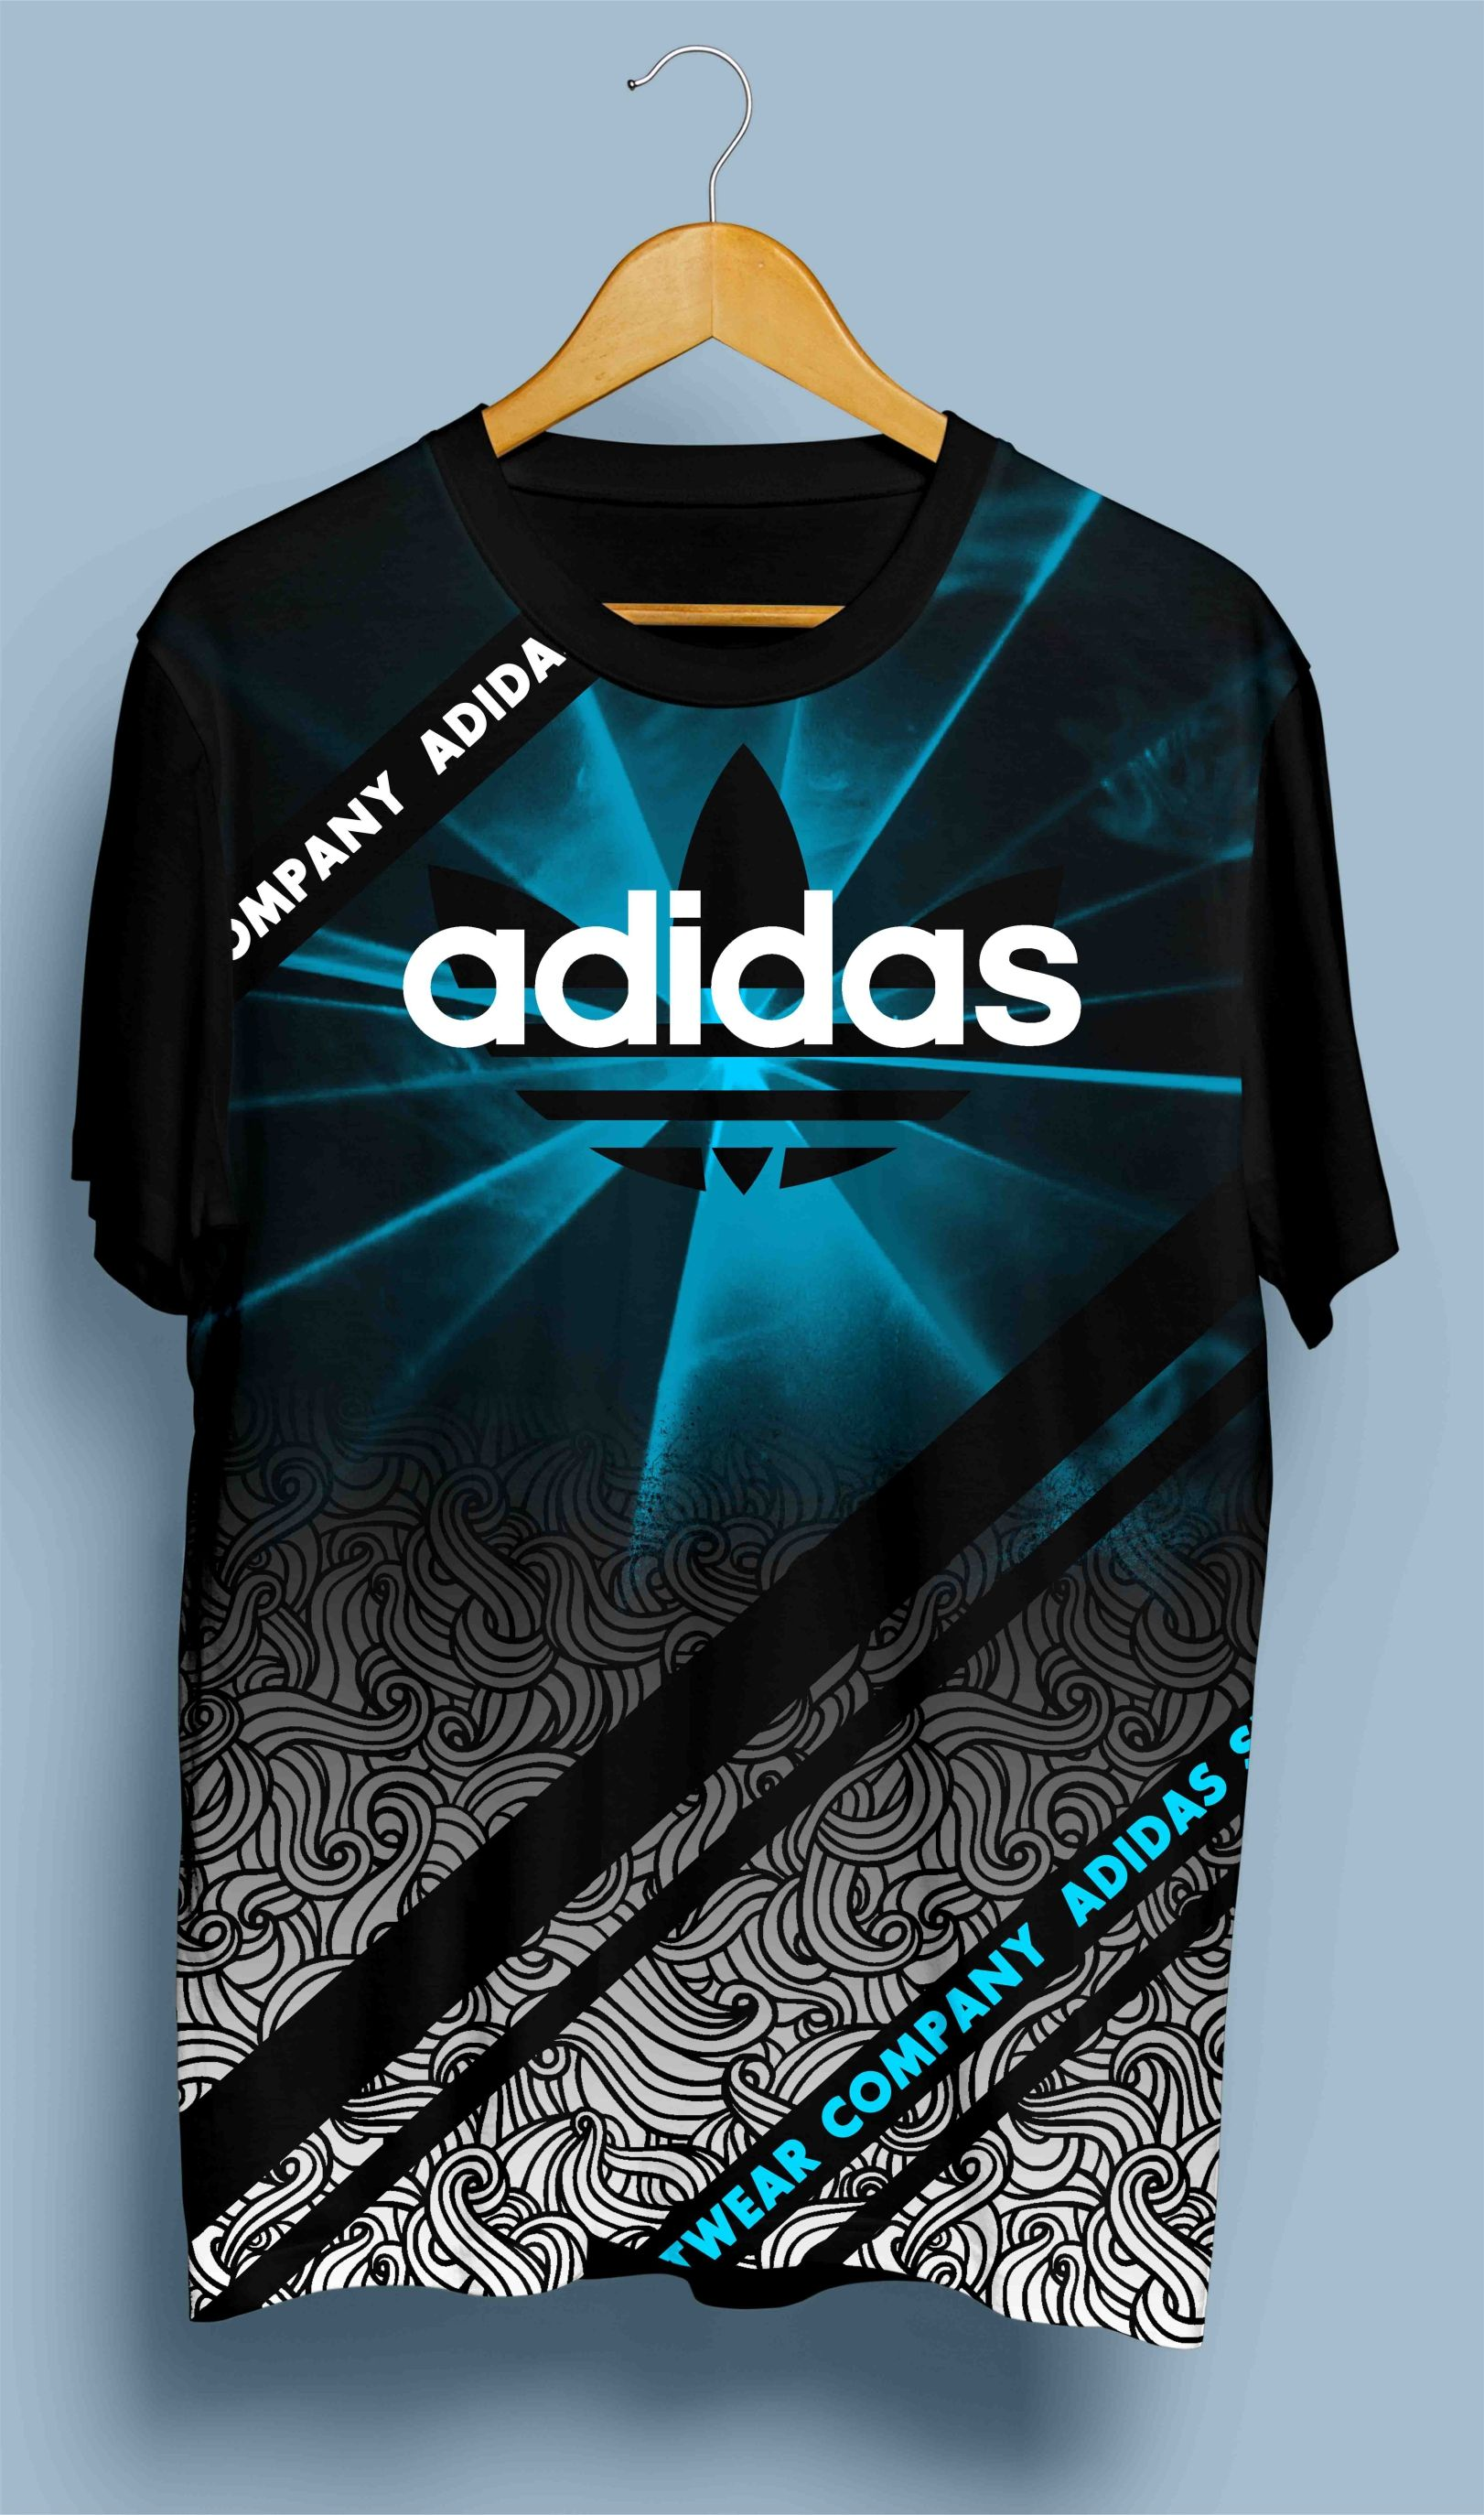 123b9da50786 #surf #tees #dc #t-shirtdesign #dcshoecousa #tshirtdc #billabong #vans  #volcom #quiksilver #ripcurl #teesorigonalsurf #hurley #insight #spyderbilt  #macbeth ...